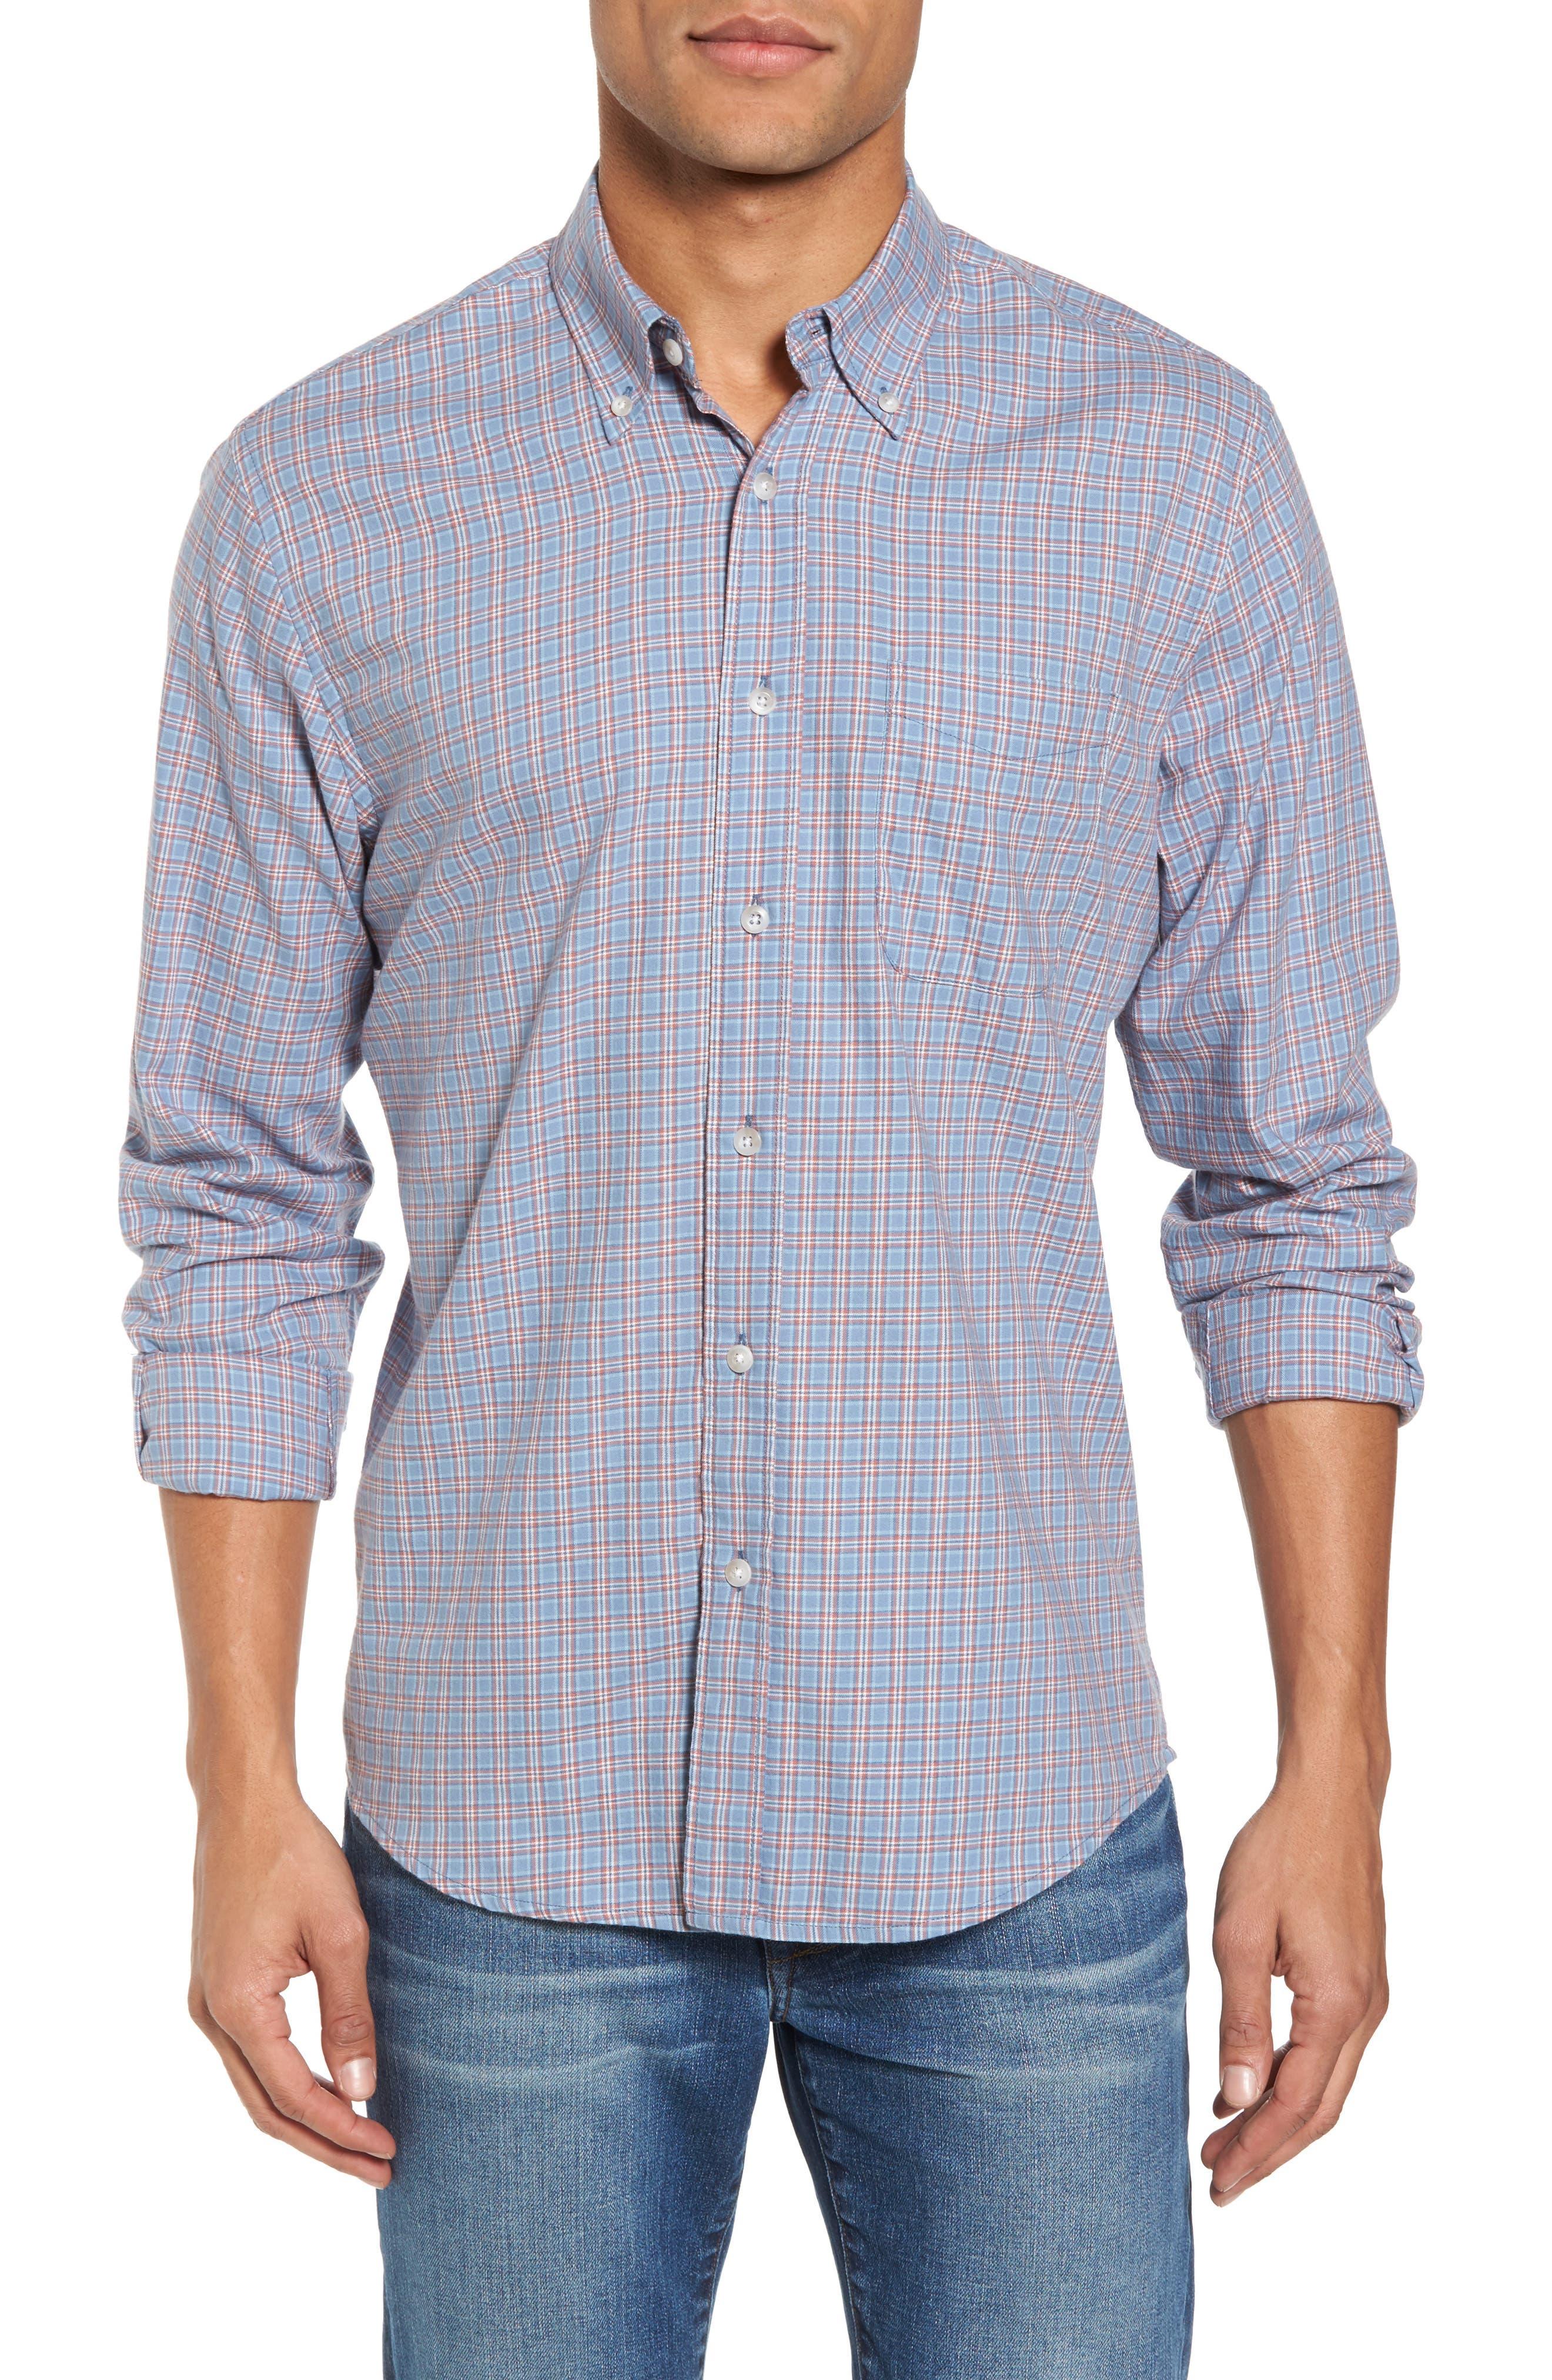 Ventura Plaid Sport Shirt,                         Main,                         color, Light Blue Autumn Check